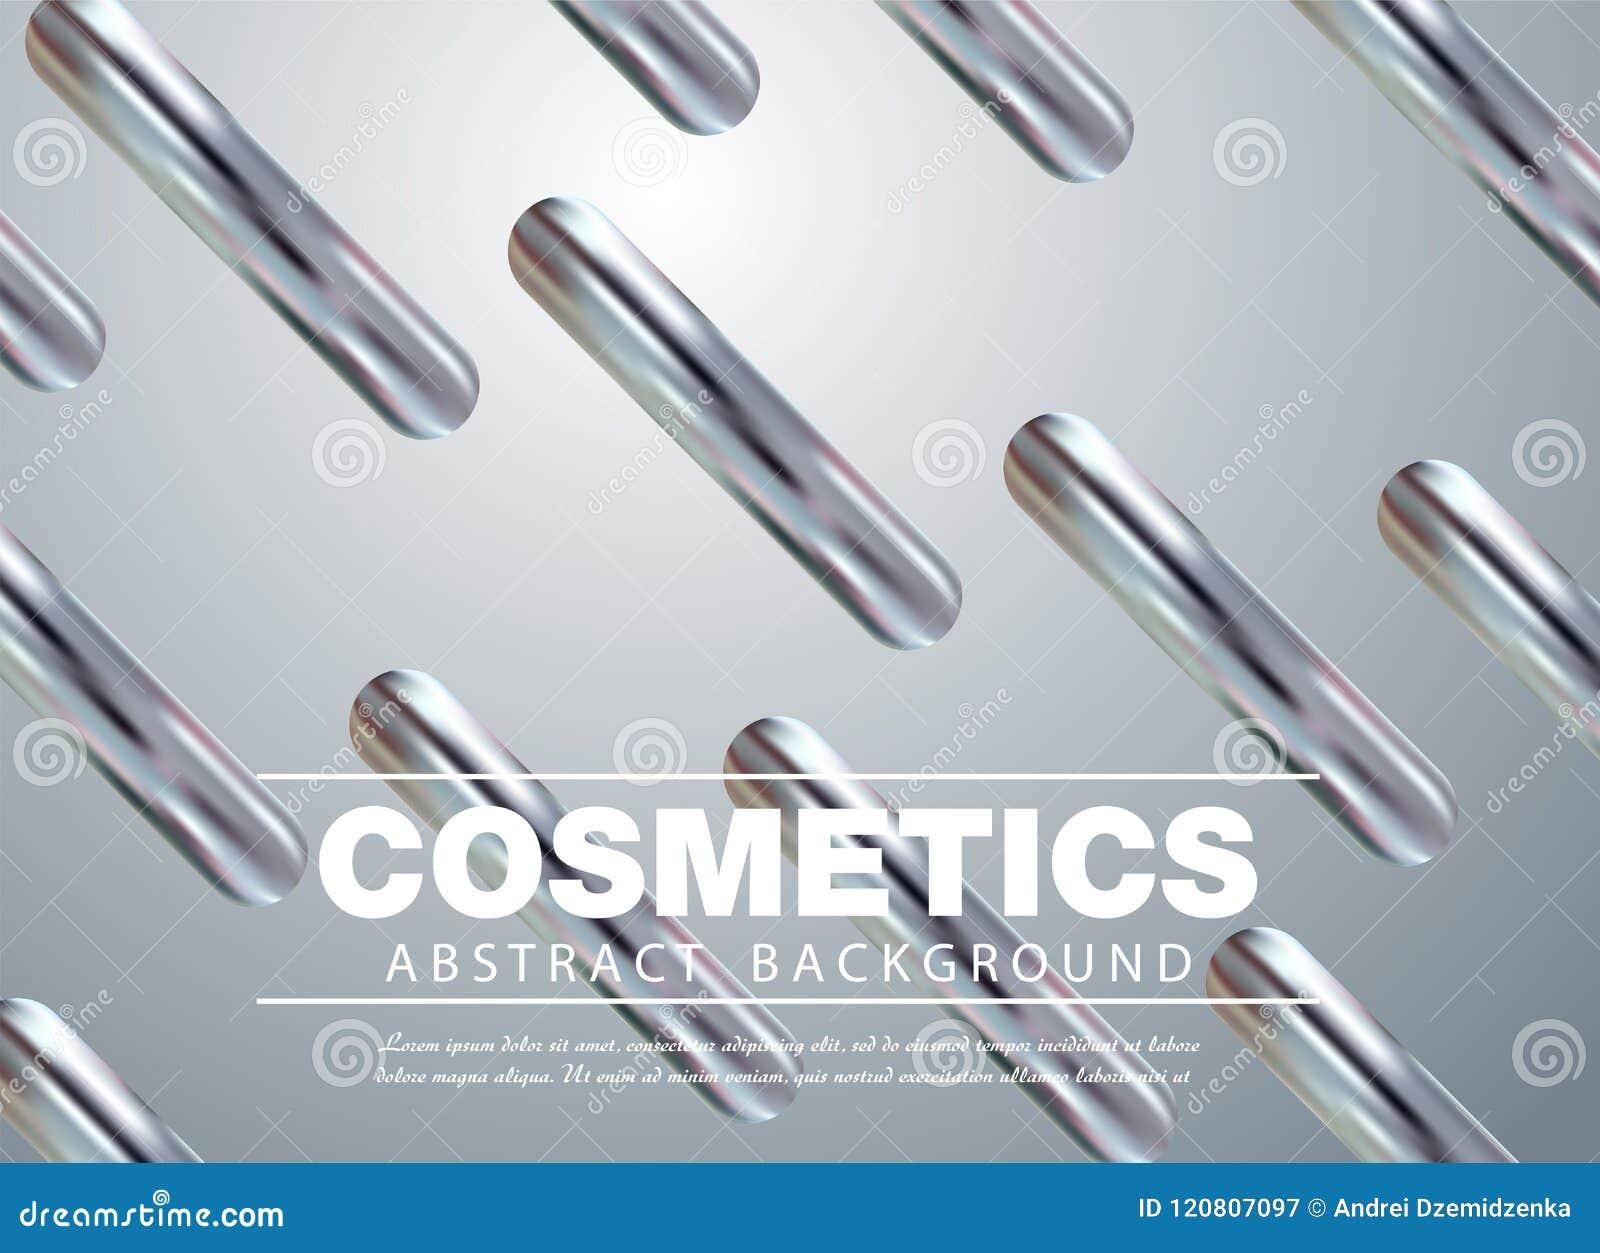 Trendy Poster Designs: Modern Trendy Cover Design. Advertising Poster For